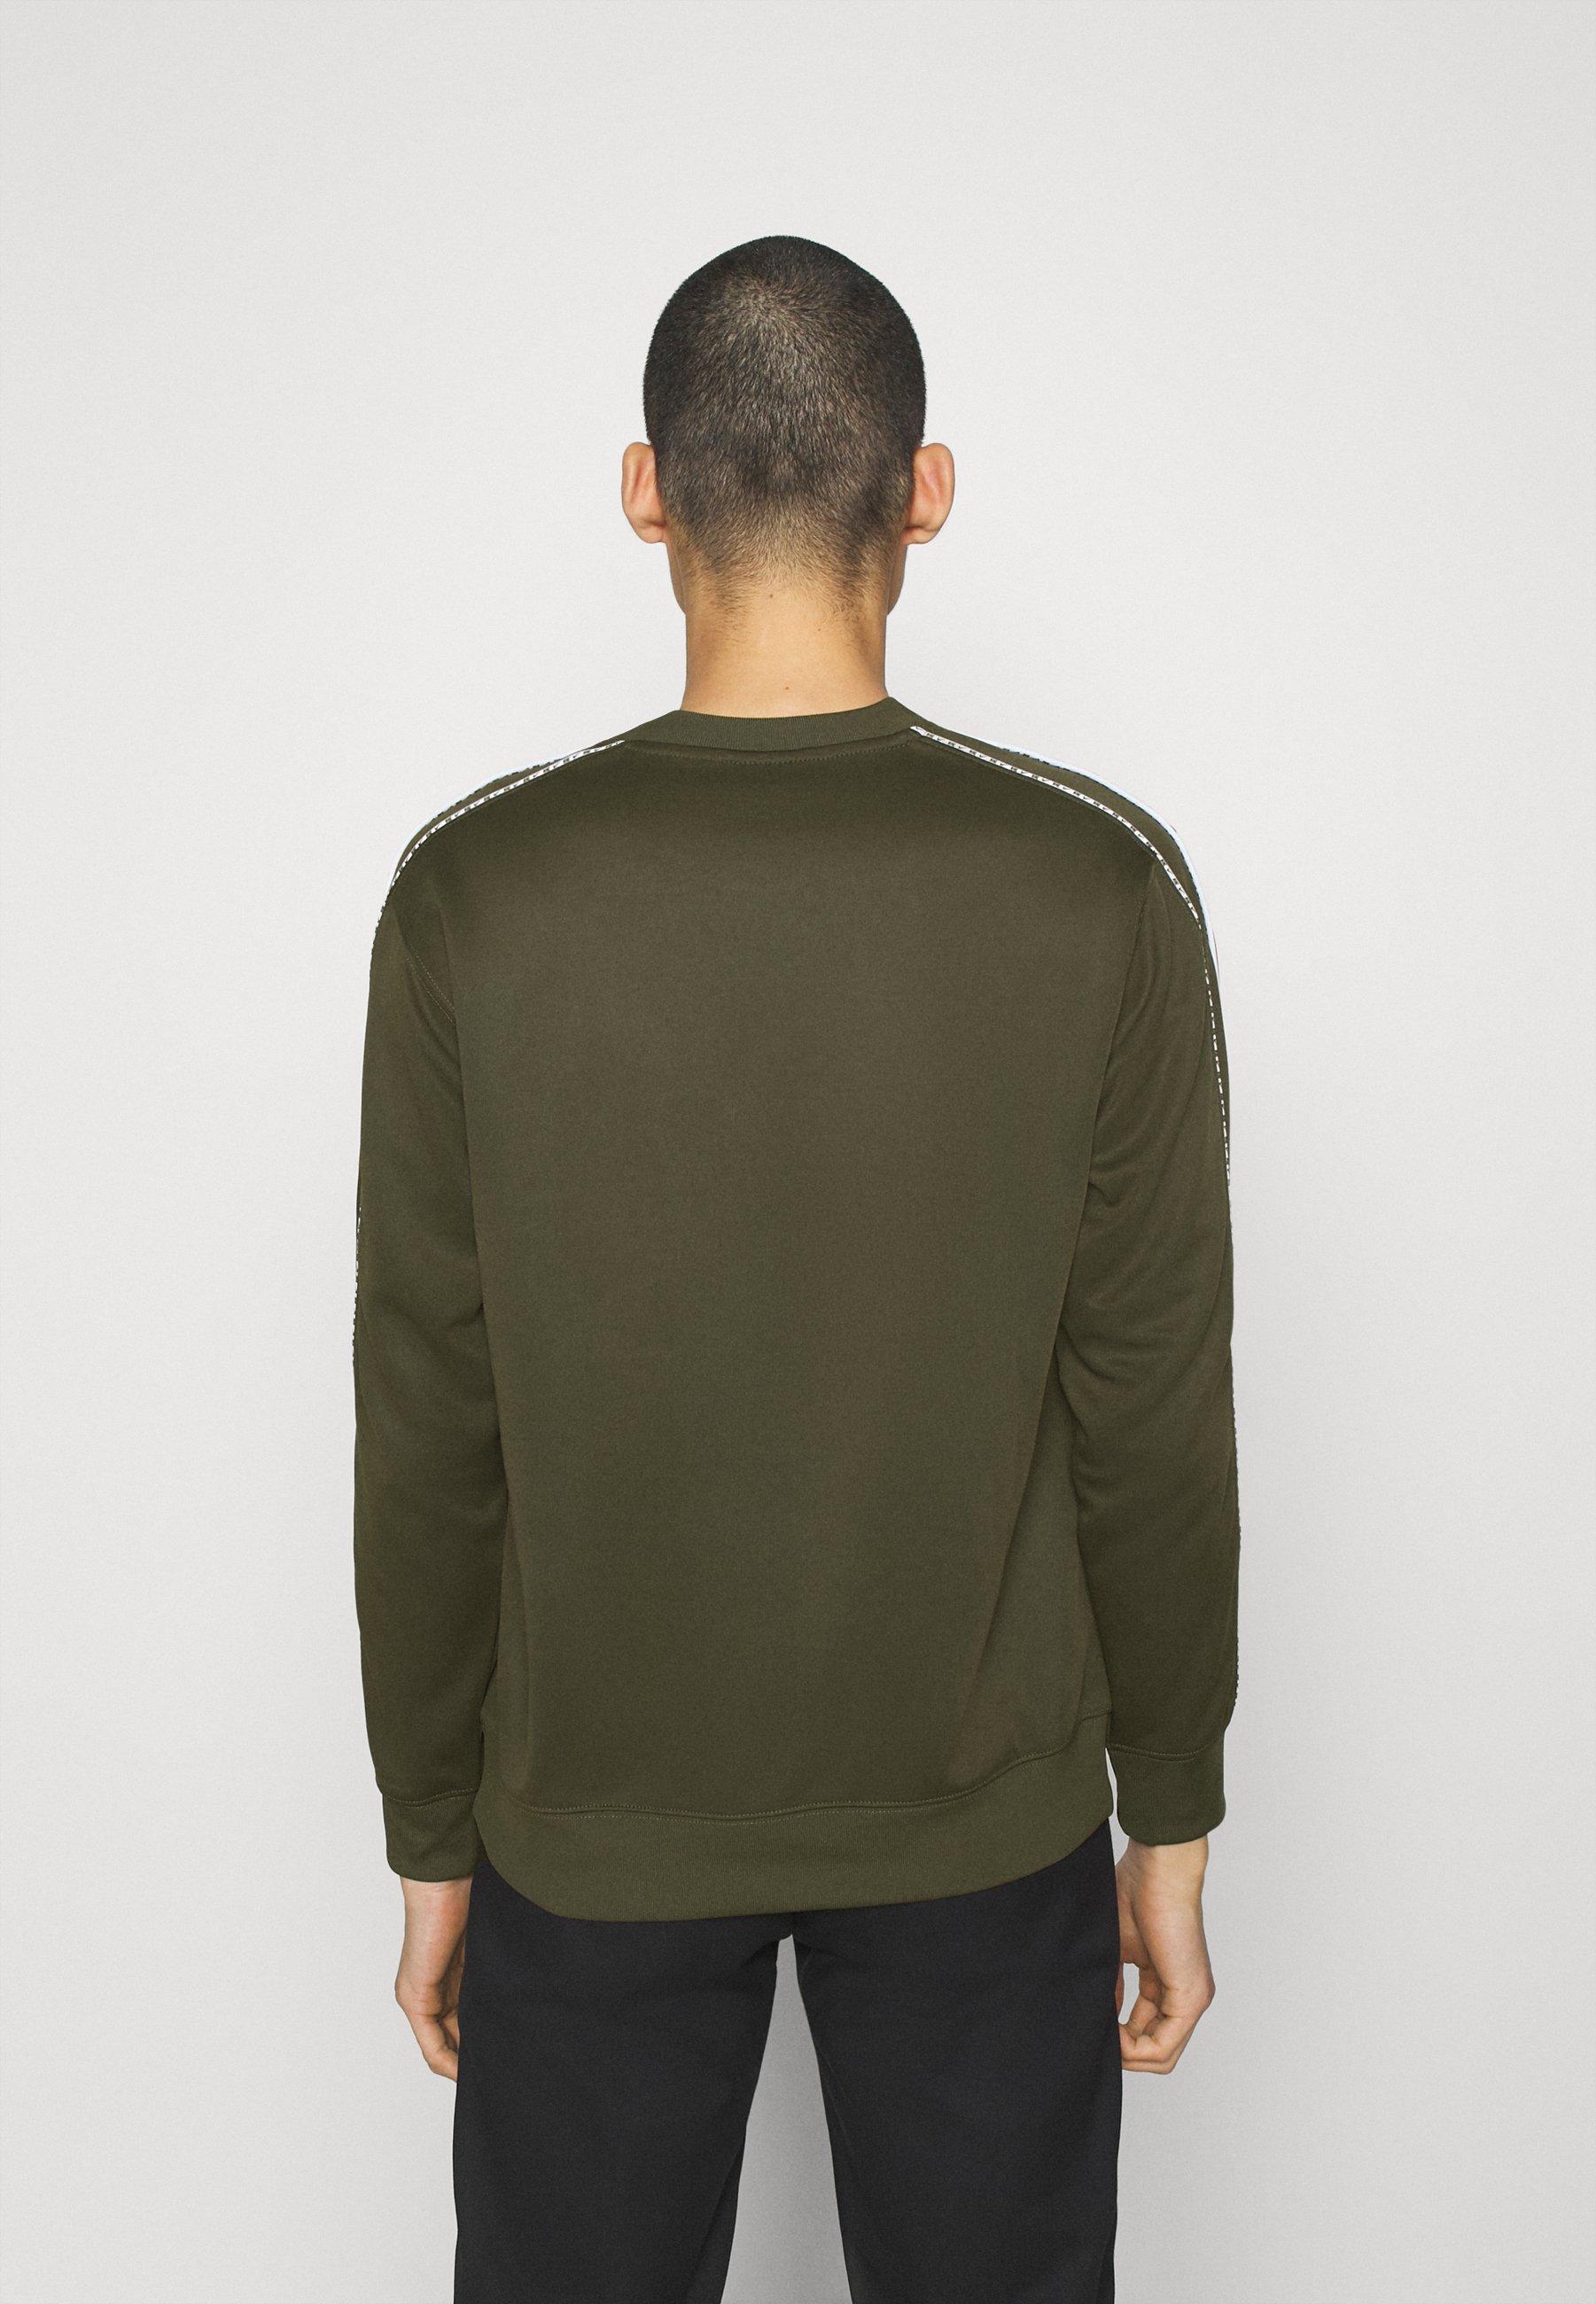 Nike Sportswear Sweatshirt - cargo khaki/oliv - Herrenwinterkleidung dO6EV